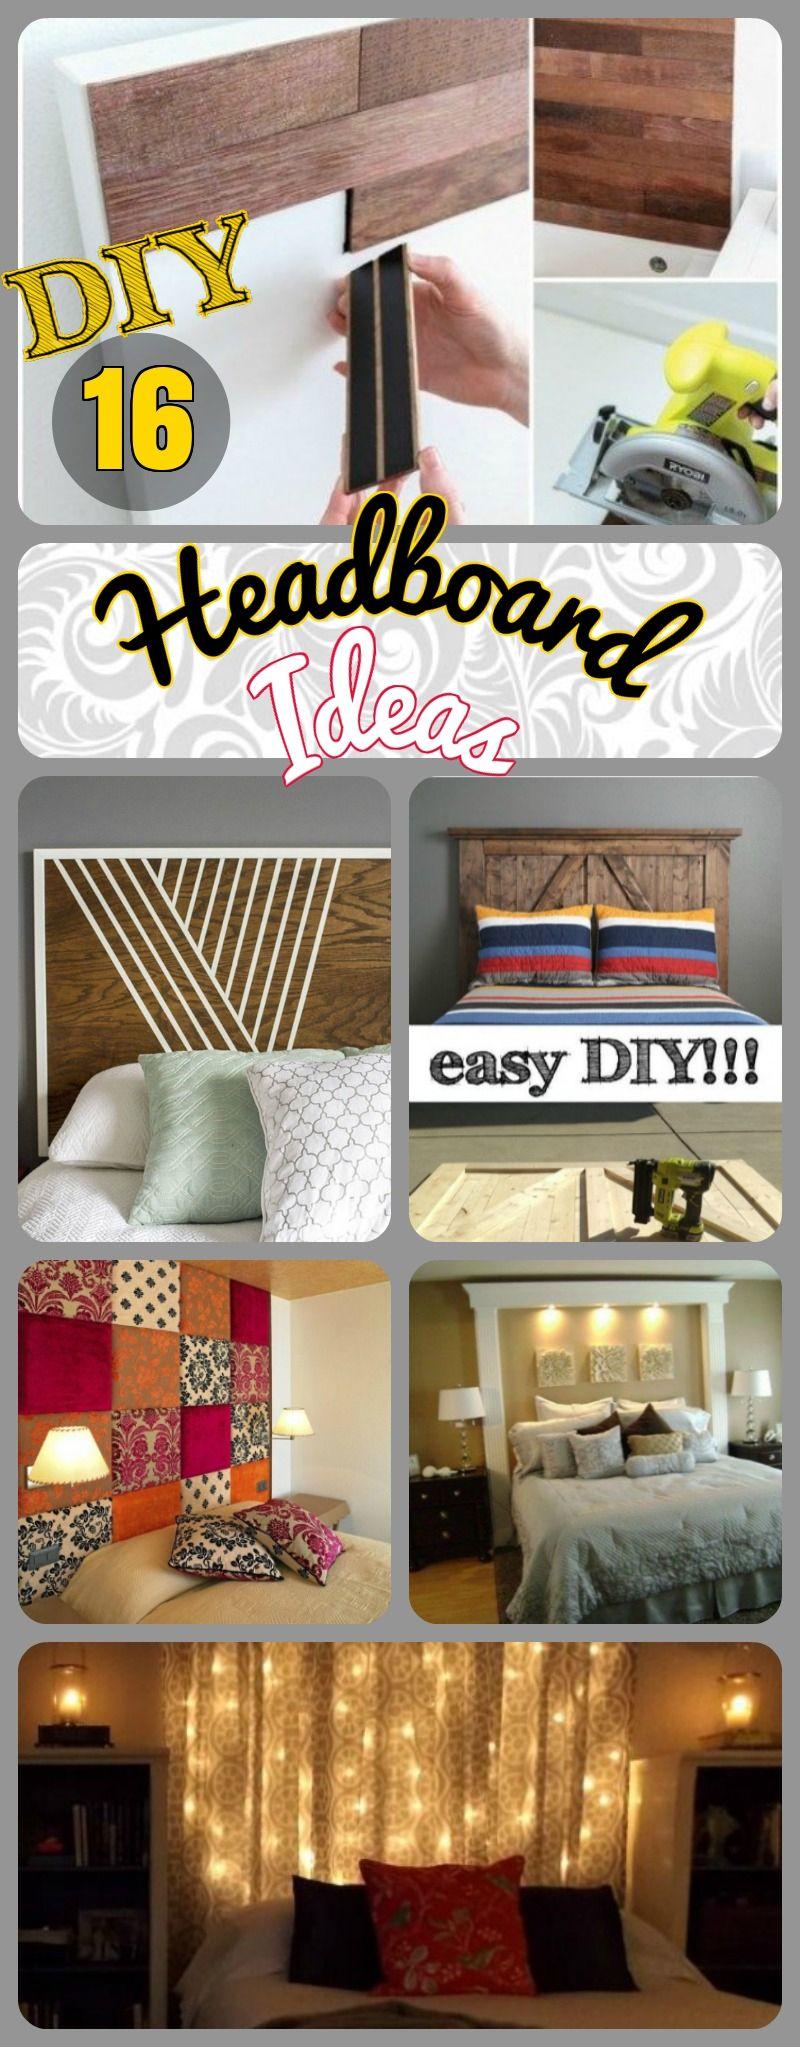 16 Diy Headboard Ideas For A Classy Bedroom On Budget Easy Rustic